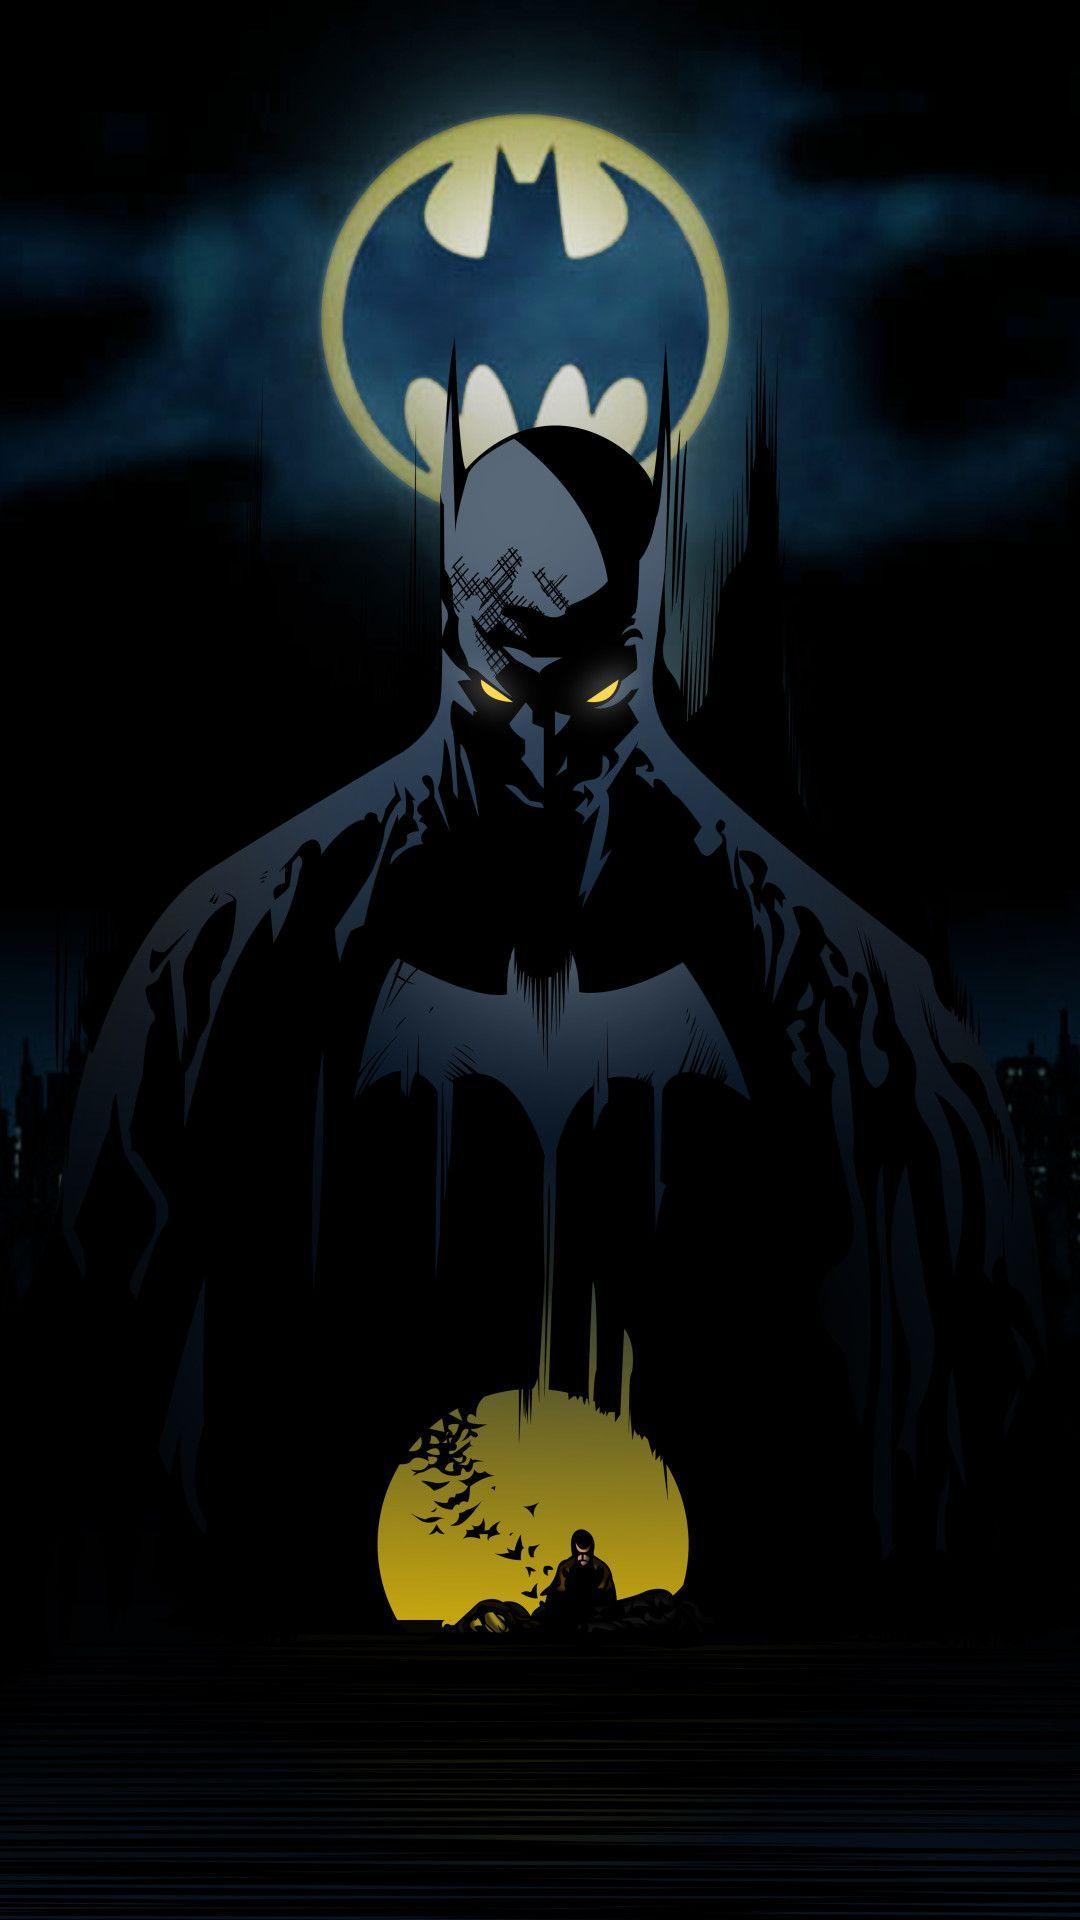 Batman Behind Bat Signal Mobile Wallpape Wallpapers